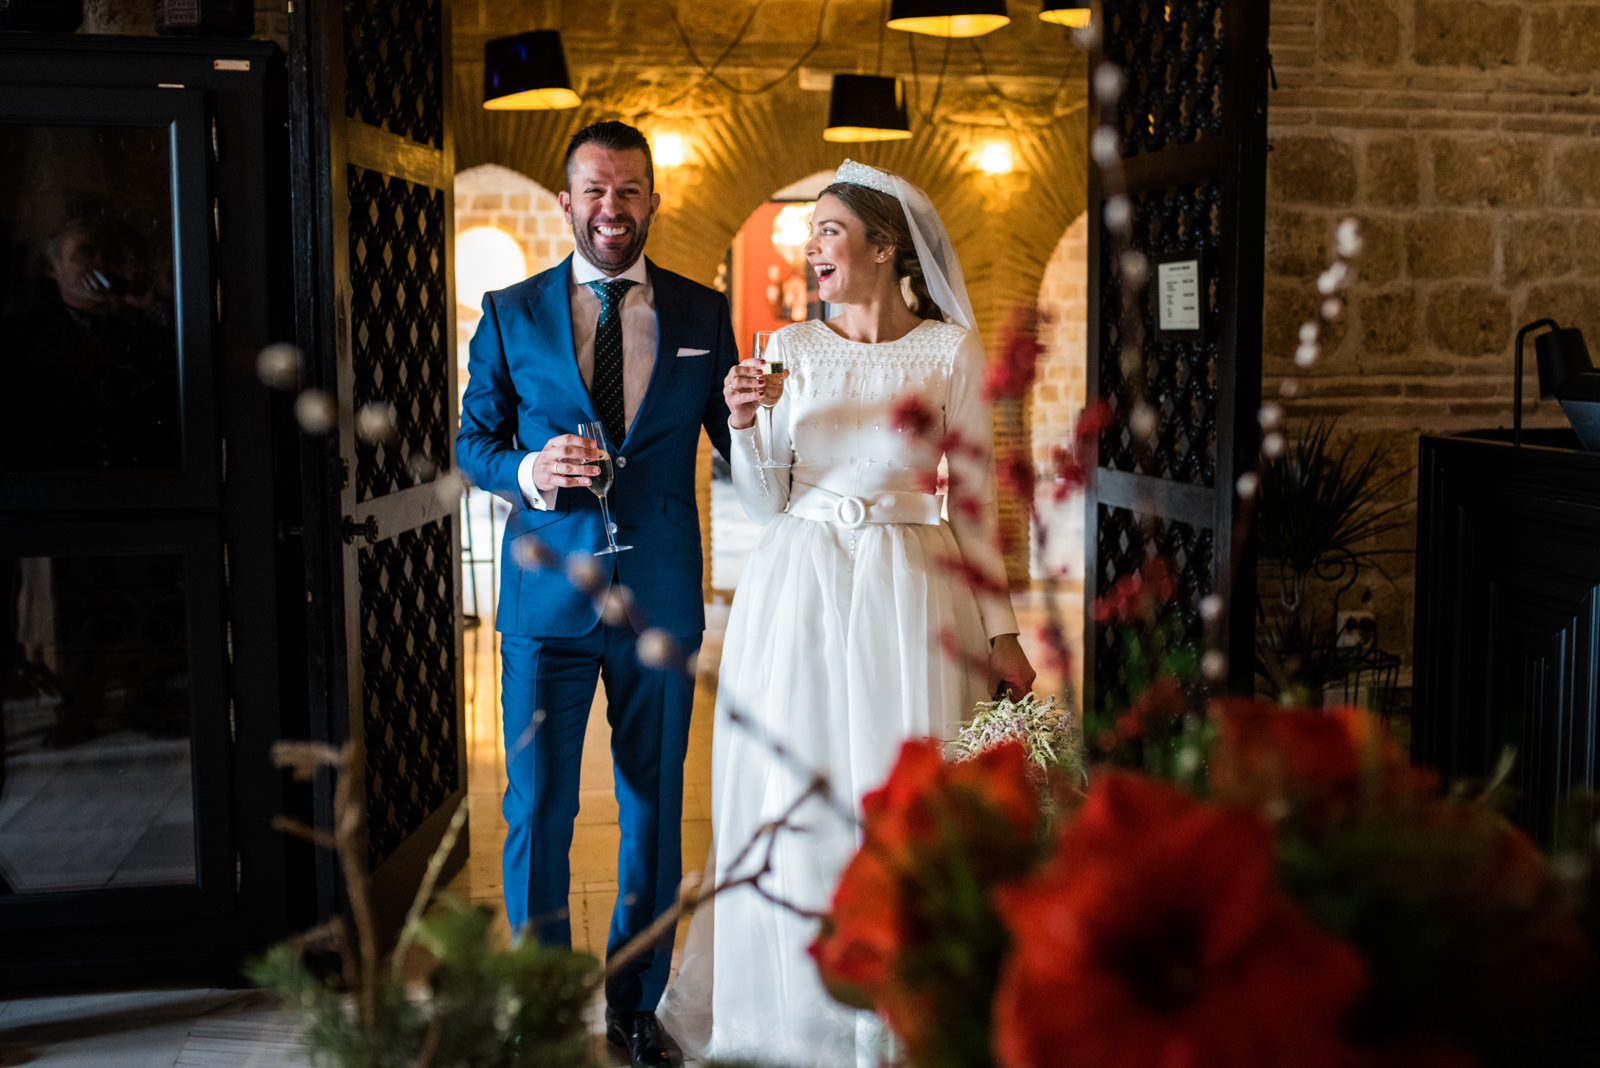 Boda-Sevilla-Parador-Carmona-bridal-engagement-Rafael-Torres-fotografo-bodas-sevilla-madrid-barcelona-wedding-photographer--53.jpg